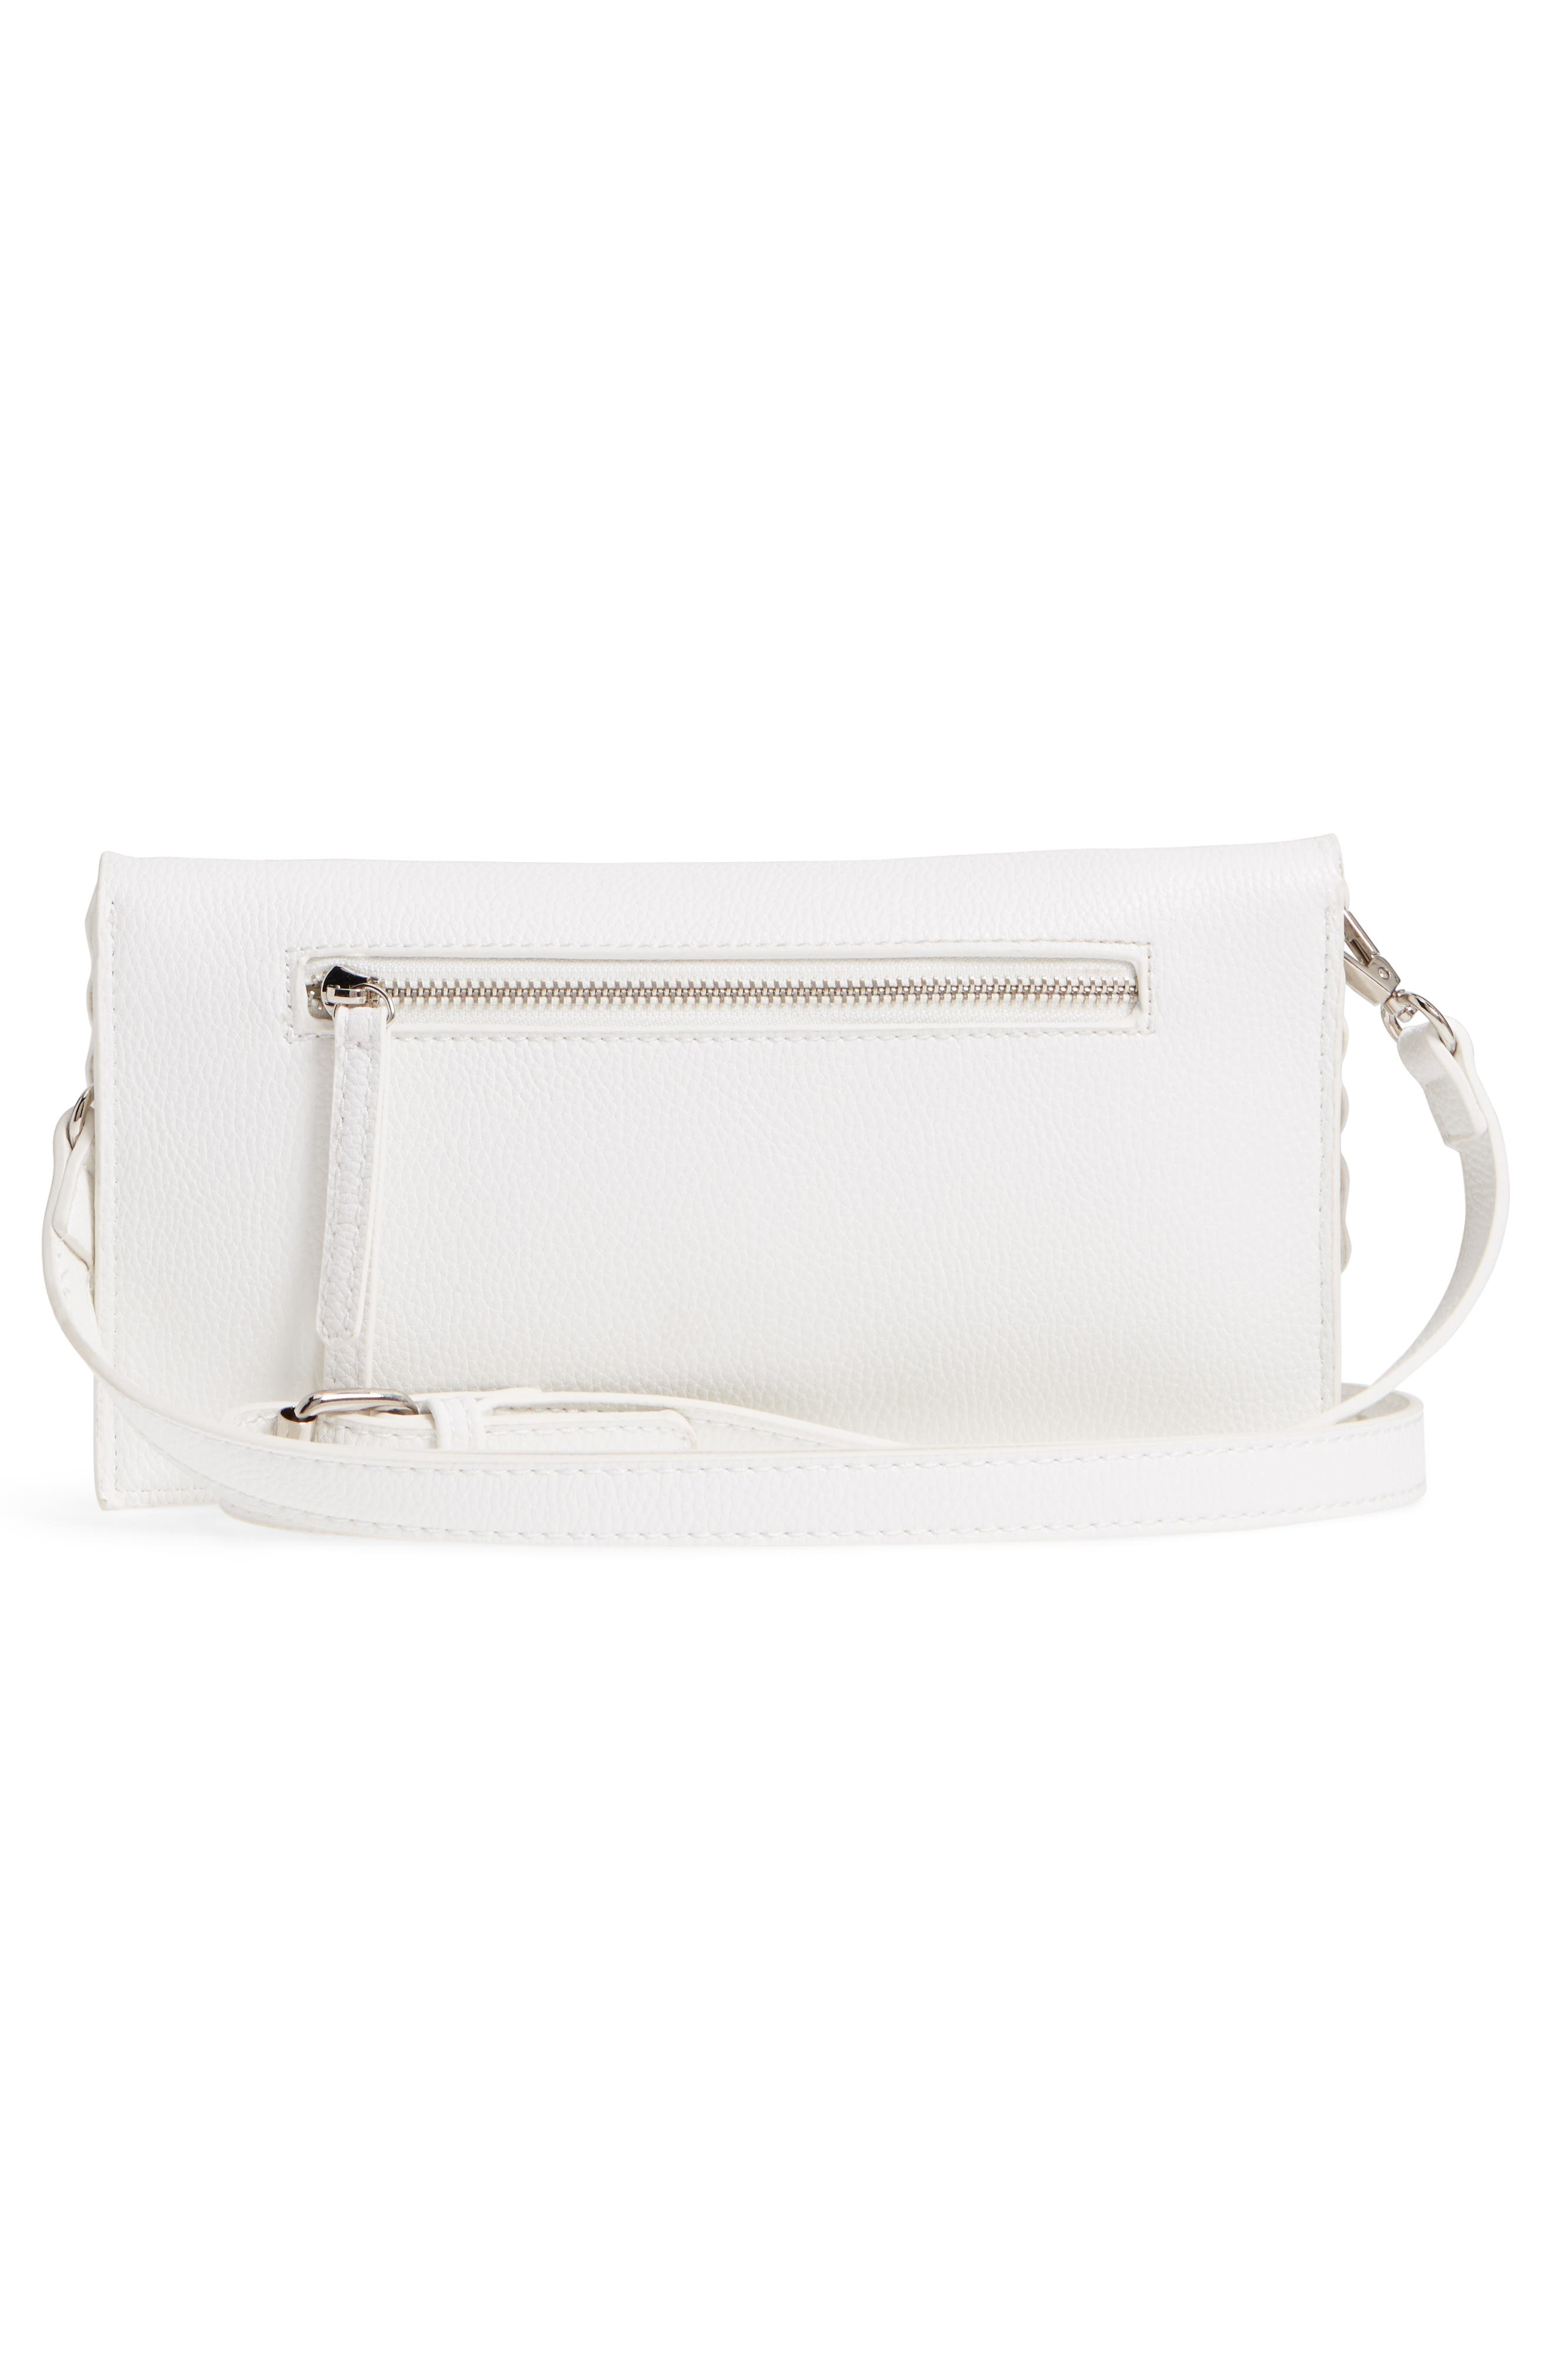 SONDRA ROBERTS,                             Grommet Convertible Crossbody Bag,                             Alternate thumbnail 4, color,                             100